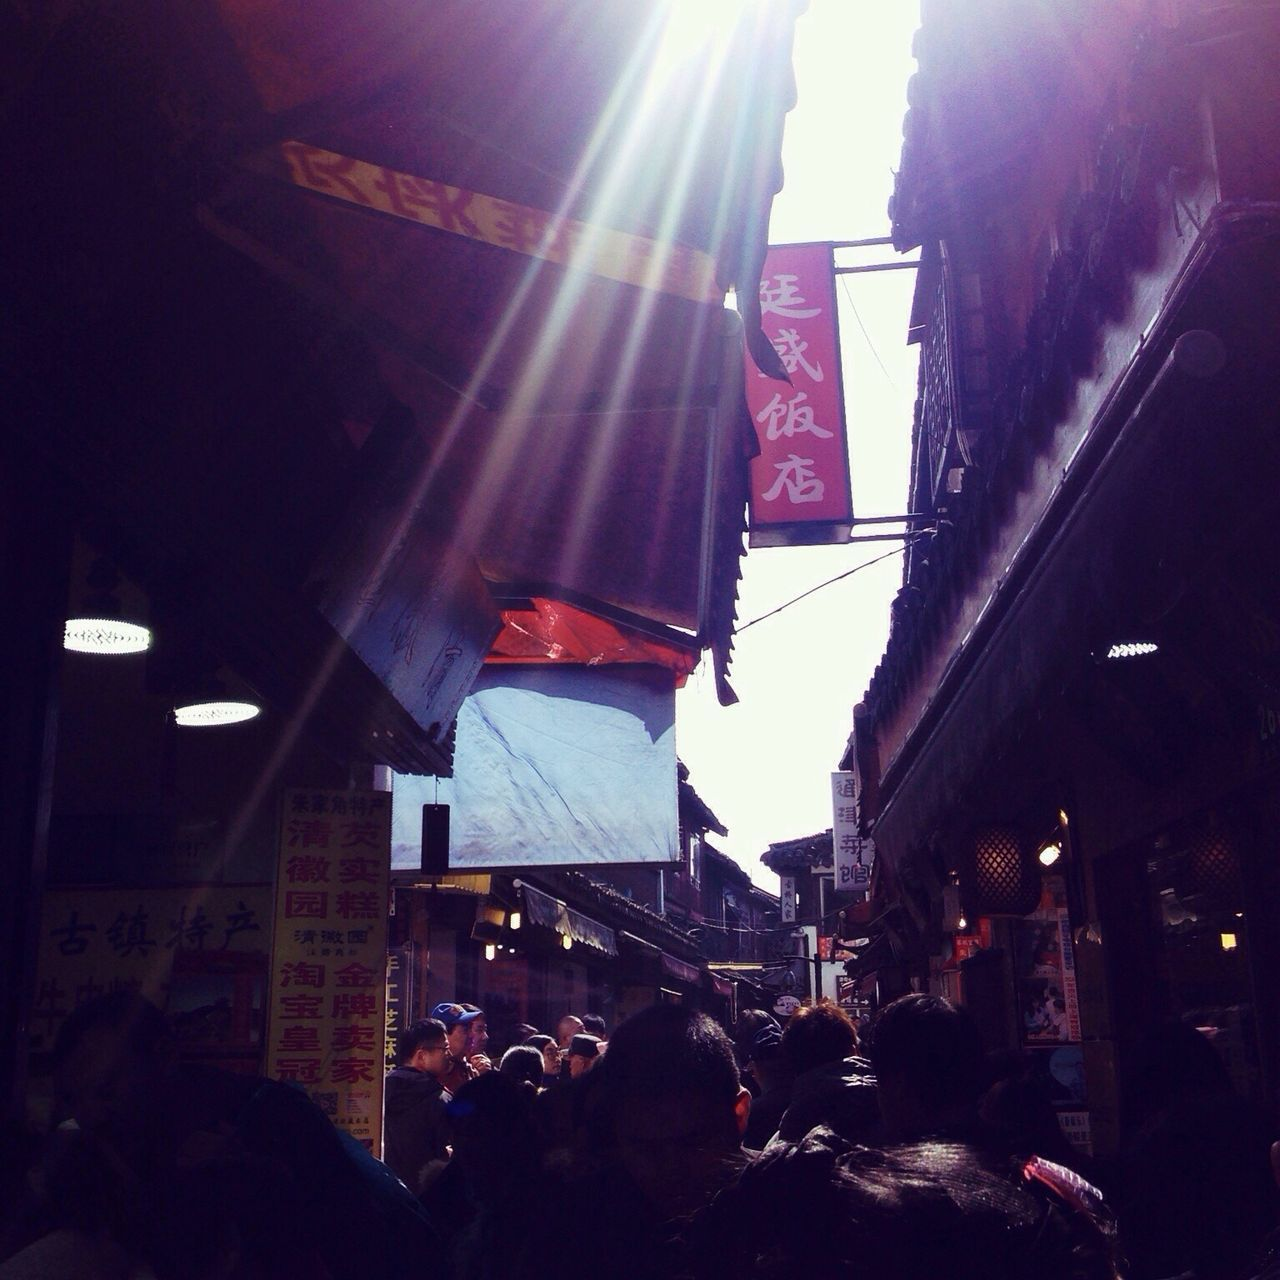 Large Group Of People Crowd Sunbeam Light And Shadow Light Zhujiajiao Shanghai China